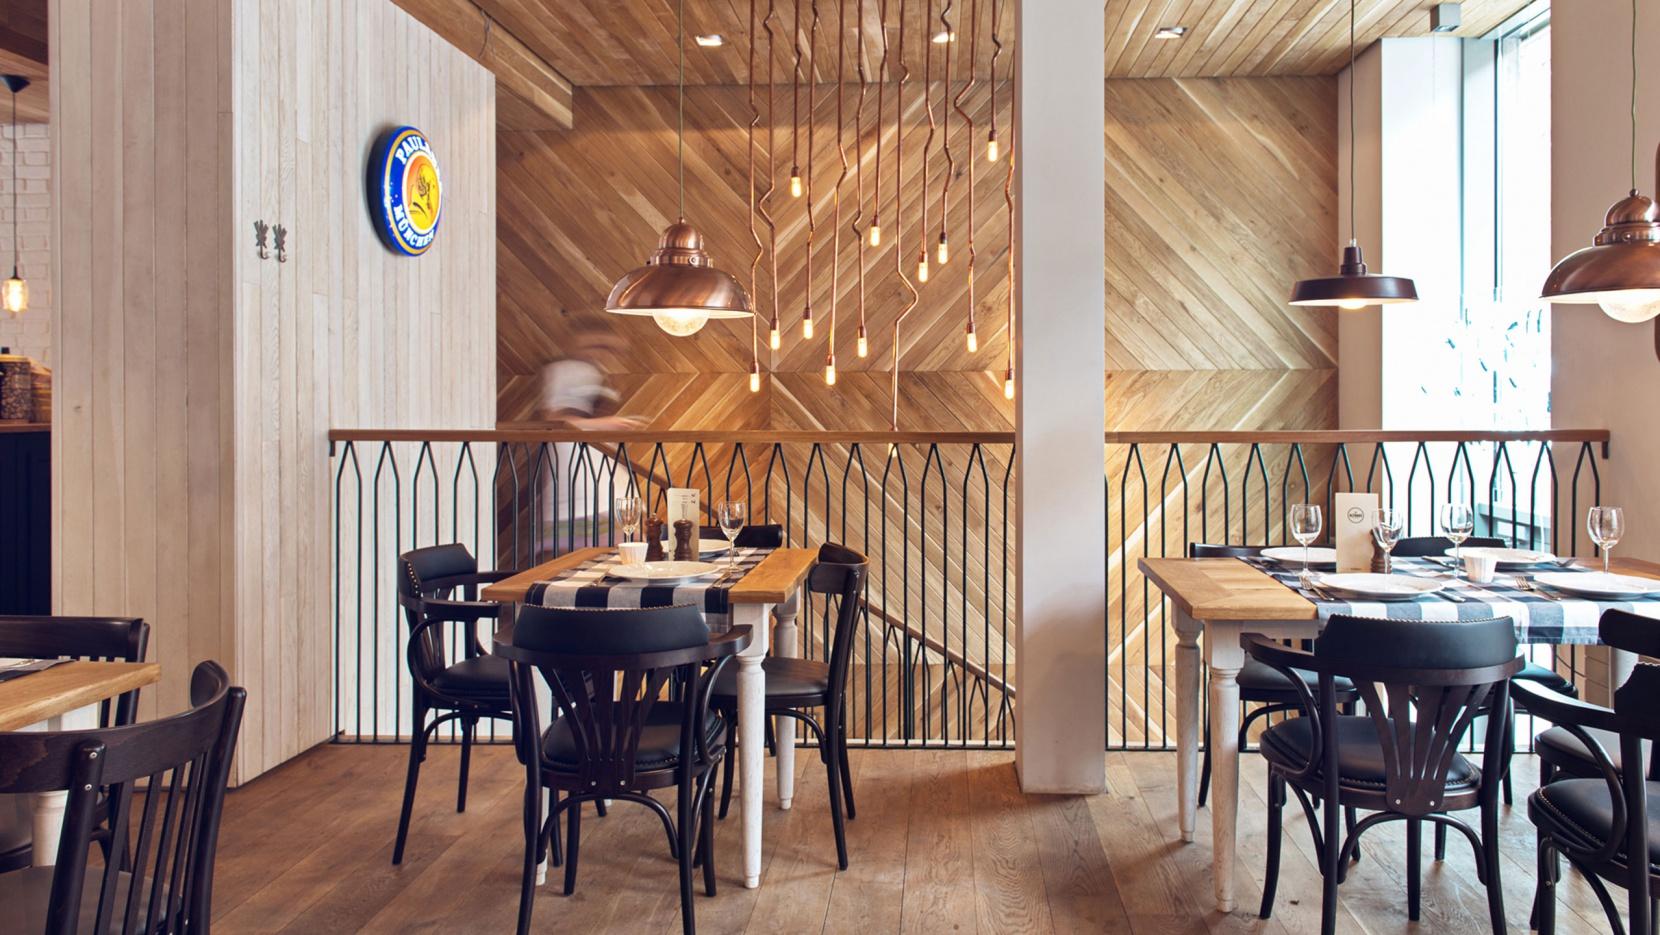 ALTHAUS Bavarian Restaurant By PB/STUDIO And Filip Kozarski In Gdynia, Poland